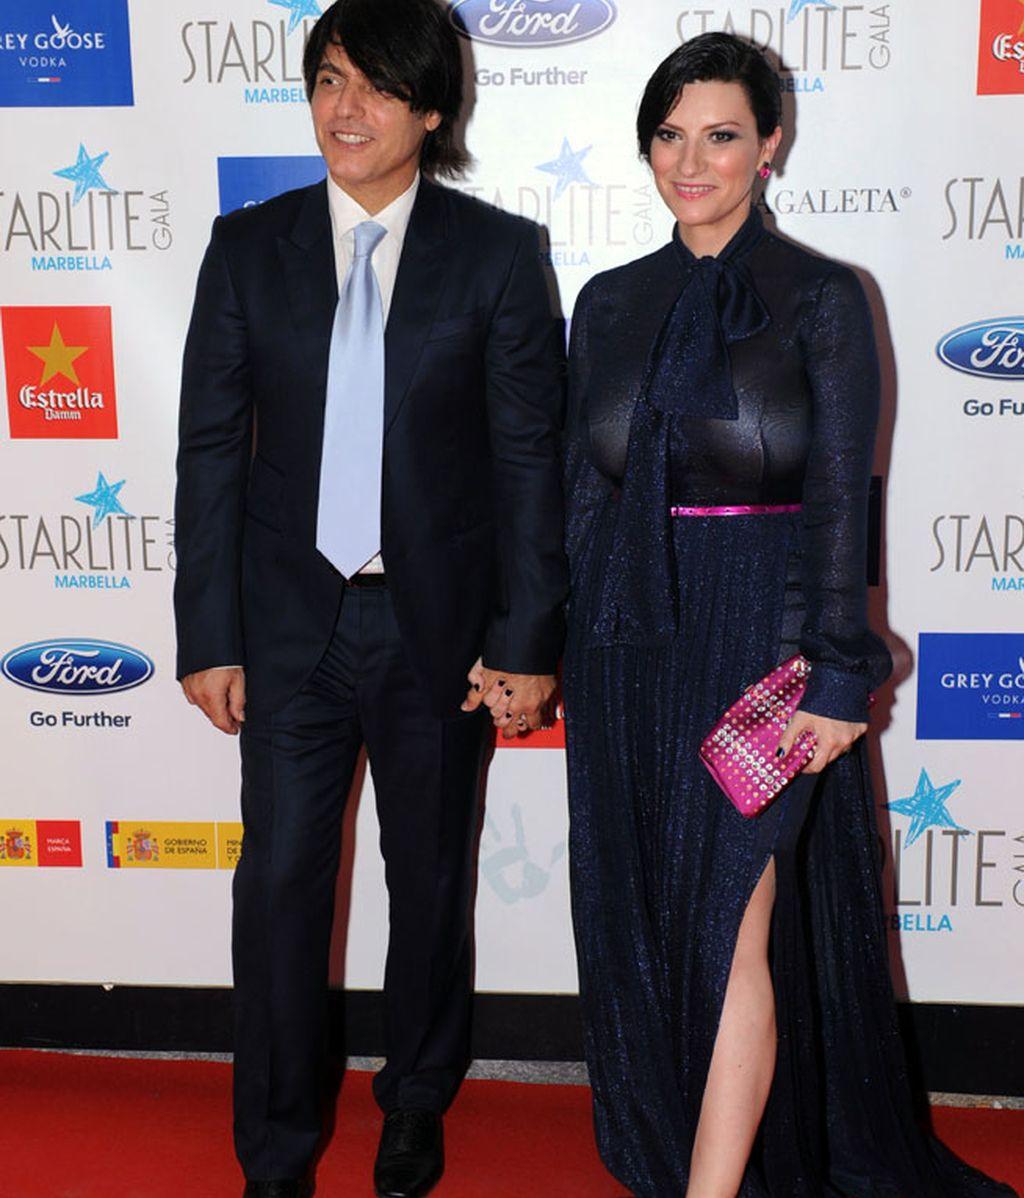 Laura Pausini acudió con su pareja, Paolo Carta